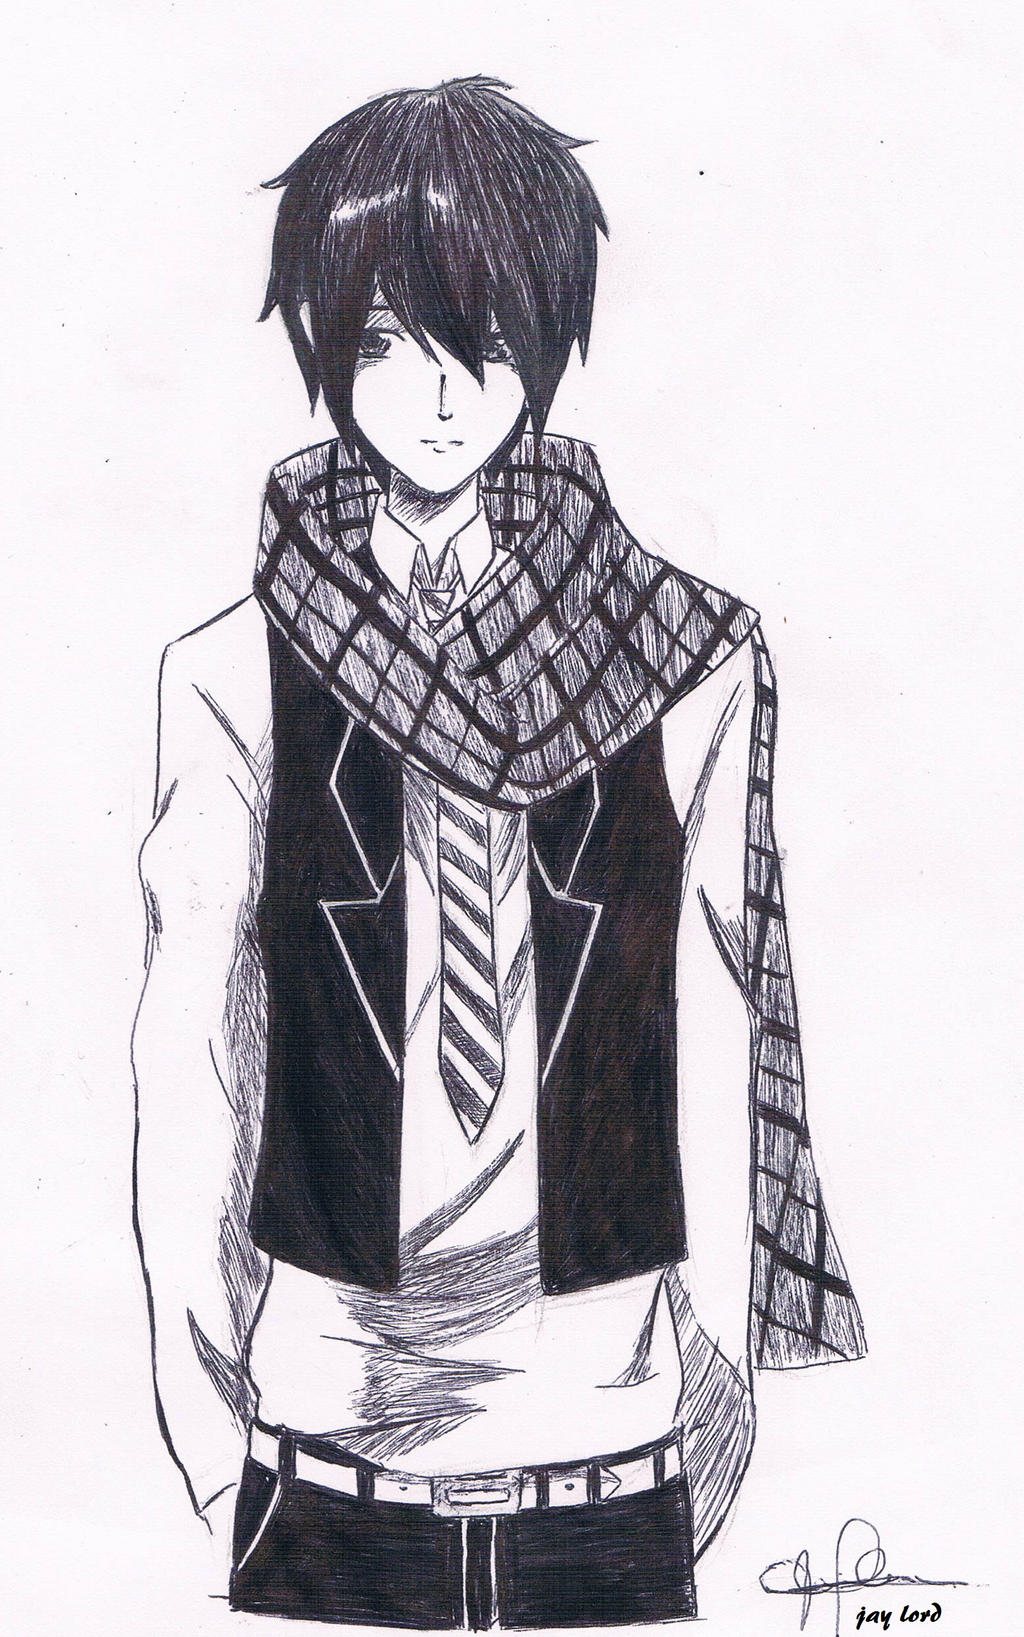 Cool Anime Guy By Jlordsasshi48 On Deviantart